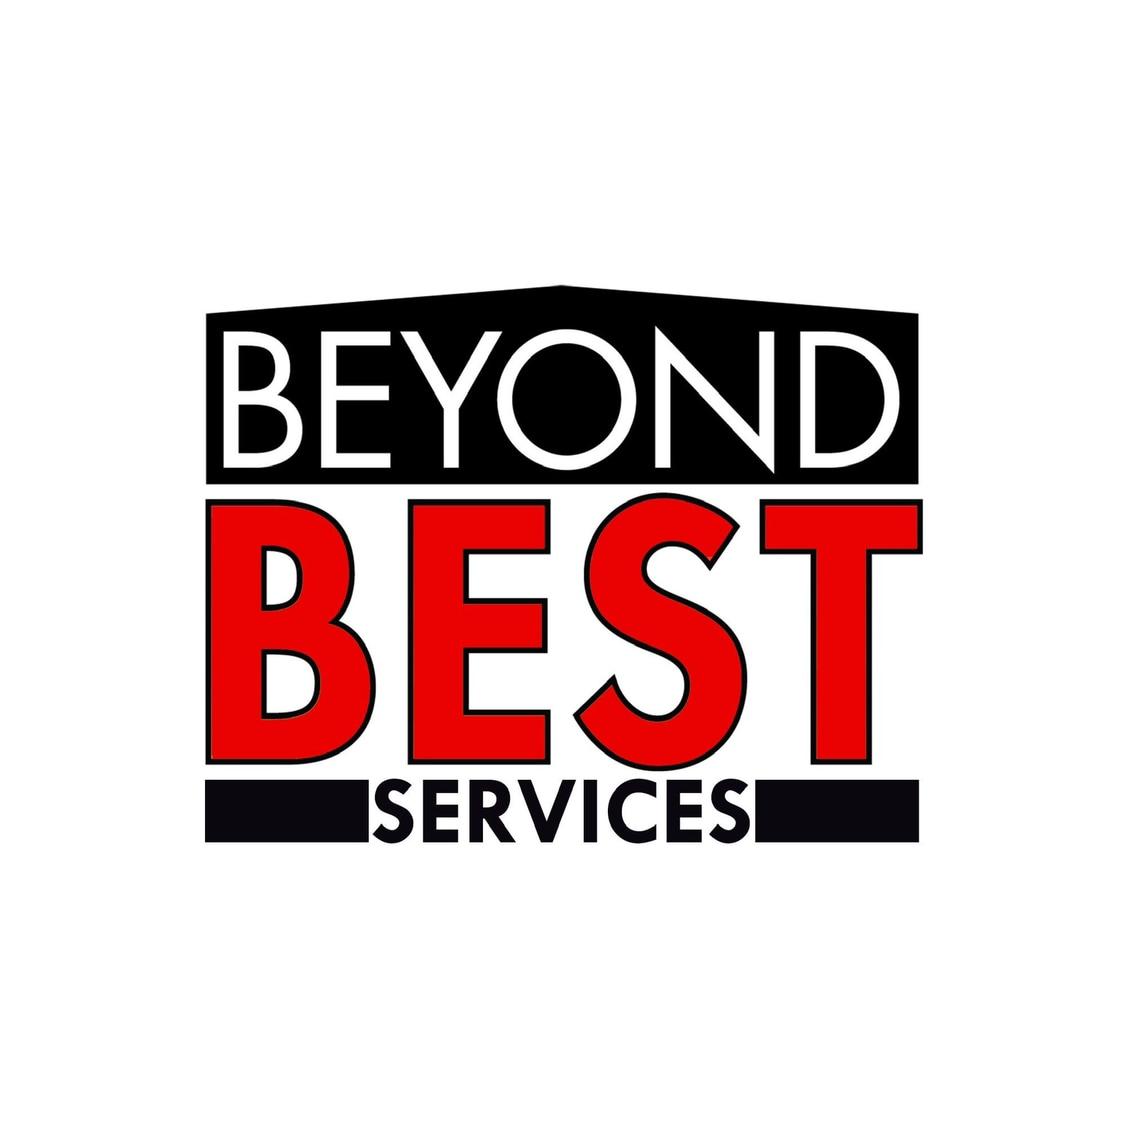 Beyond Best Services logo